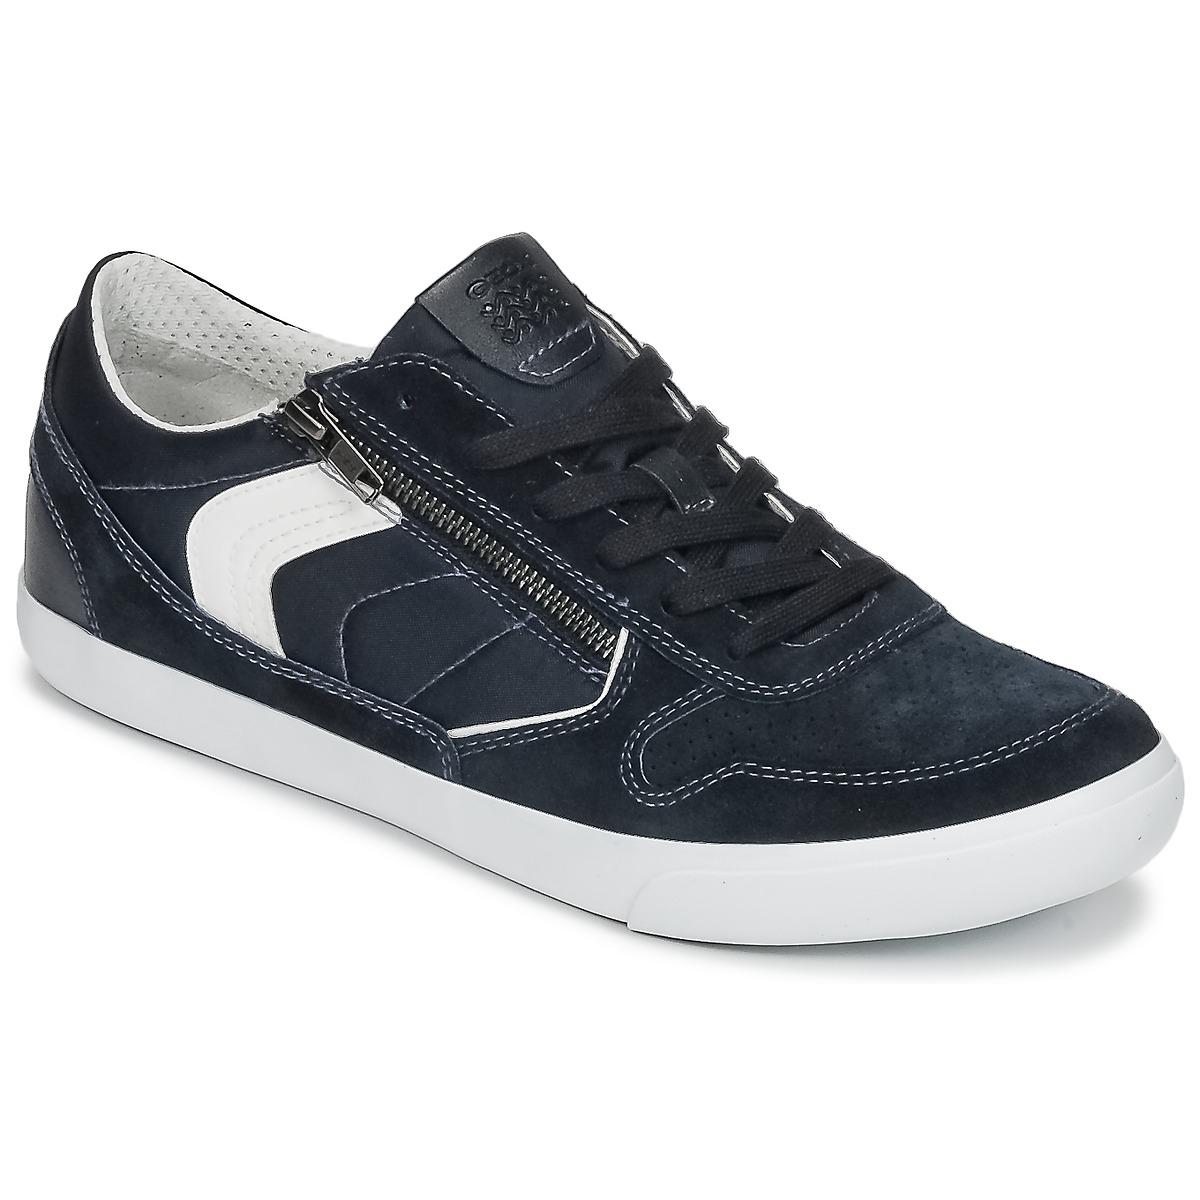 Geox U BOX C Blau - Kostenloser Versand bei Spartoode ! - Schuhe Sneaker Low Herren 59,99 €